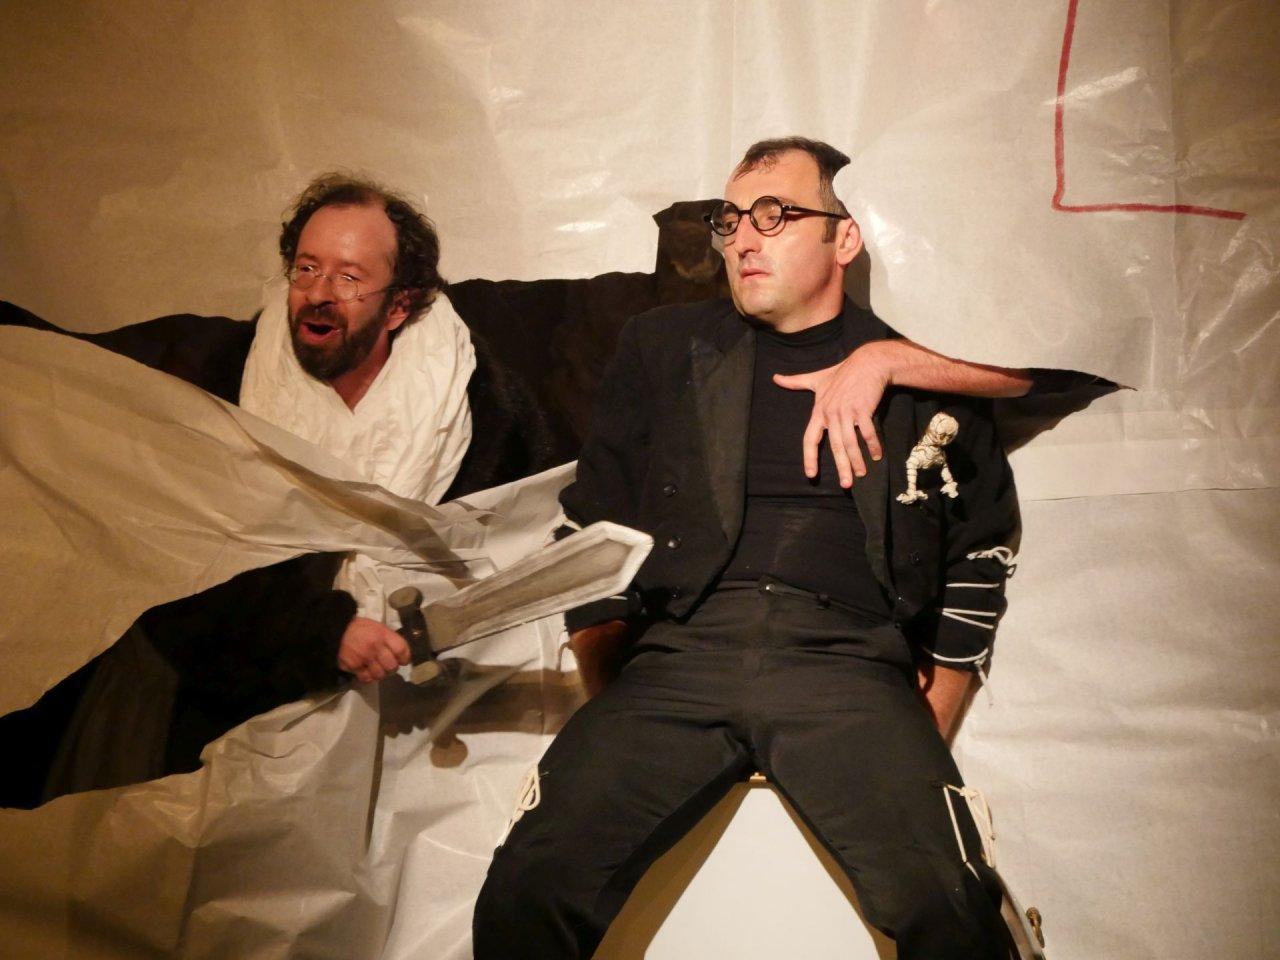 The Bastard's story (Malenki Theatre)